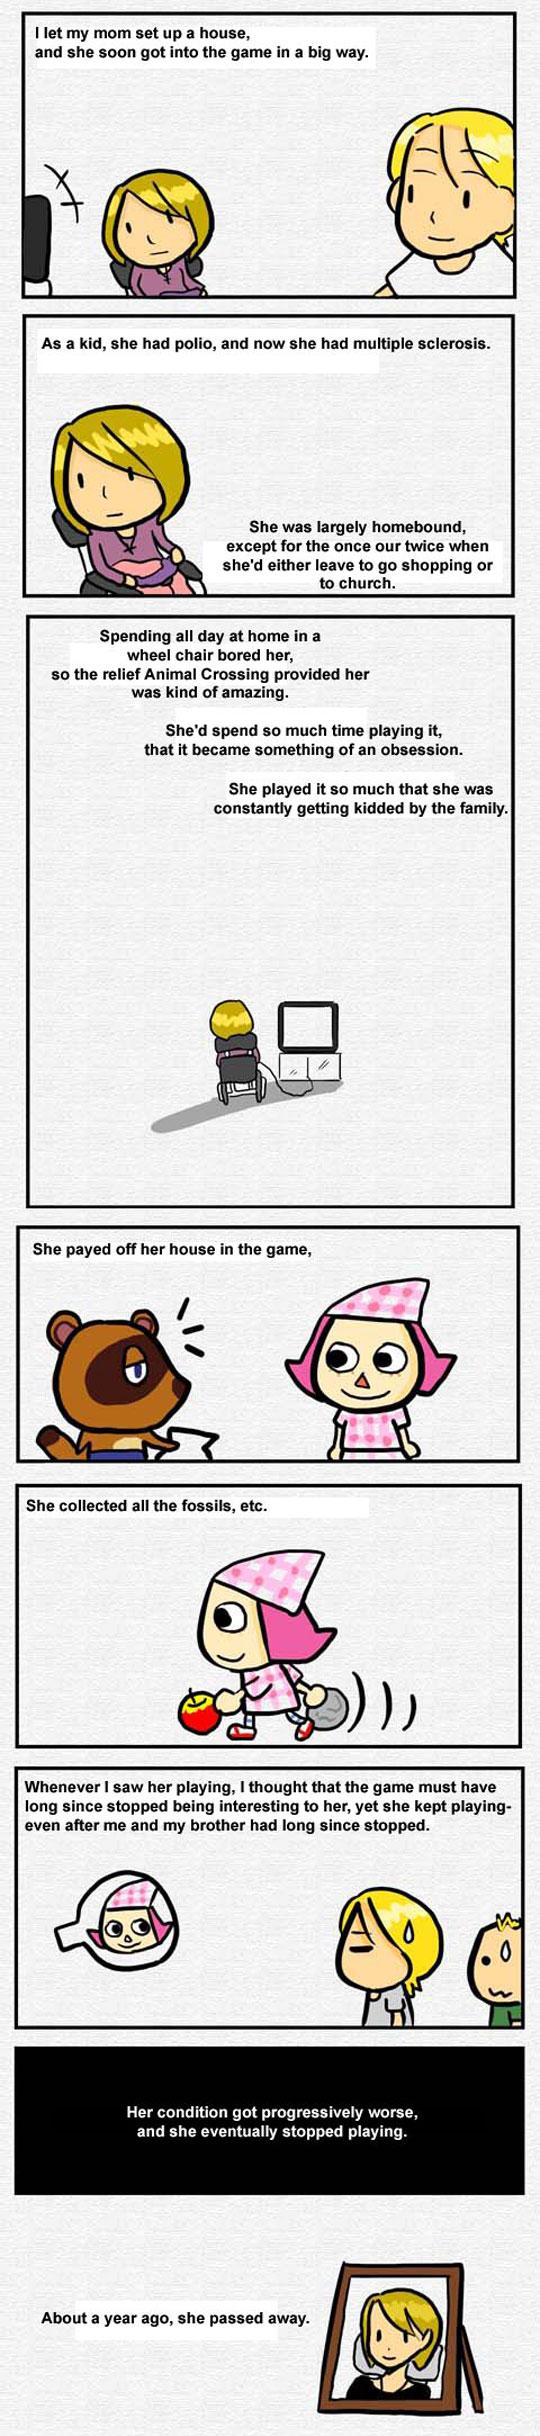 cool-cartoon-Animal-Crossing-sick-mom-gift